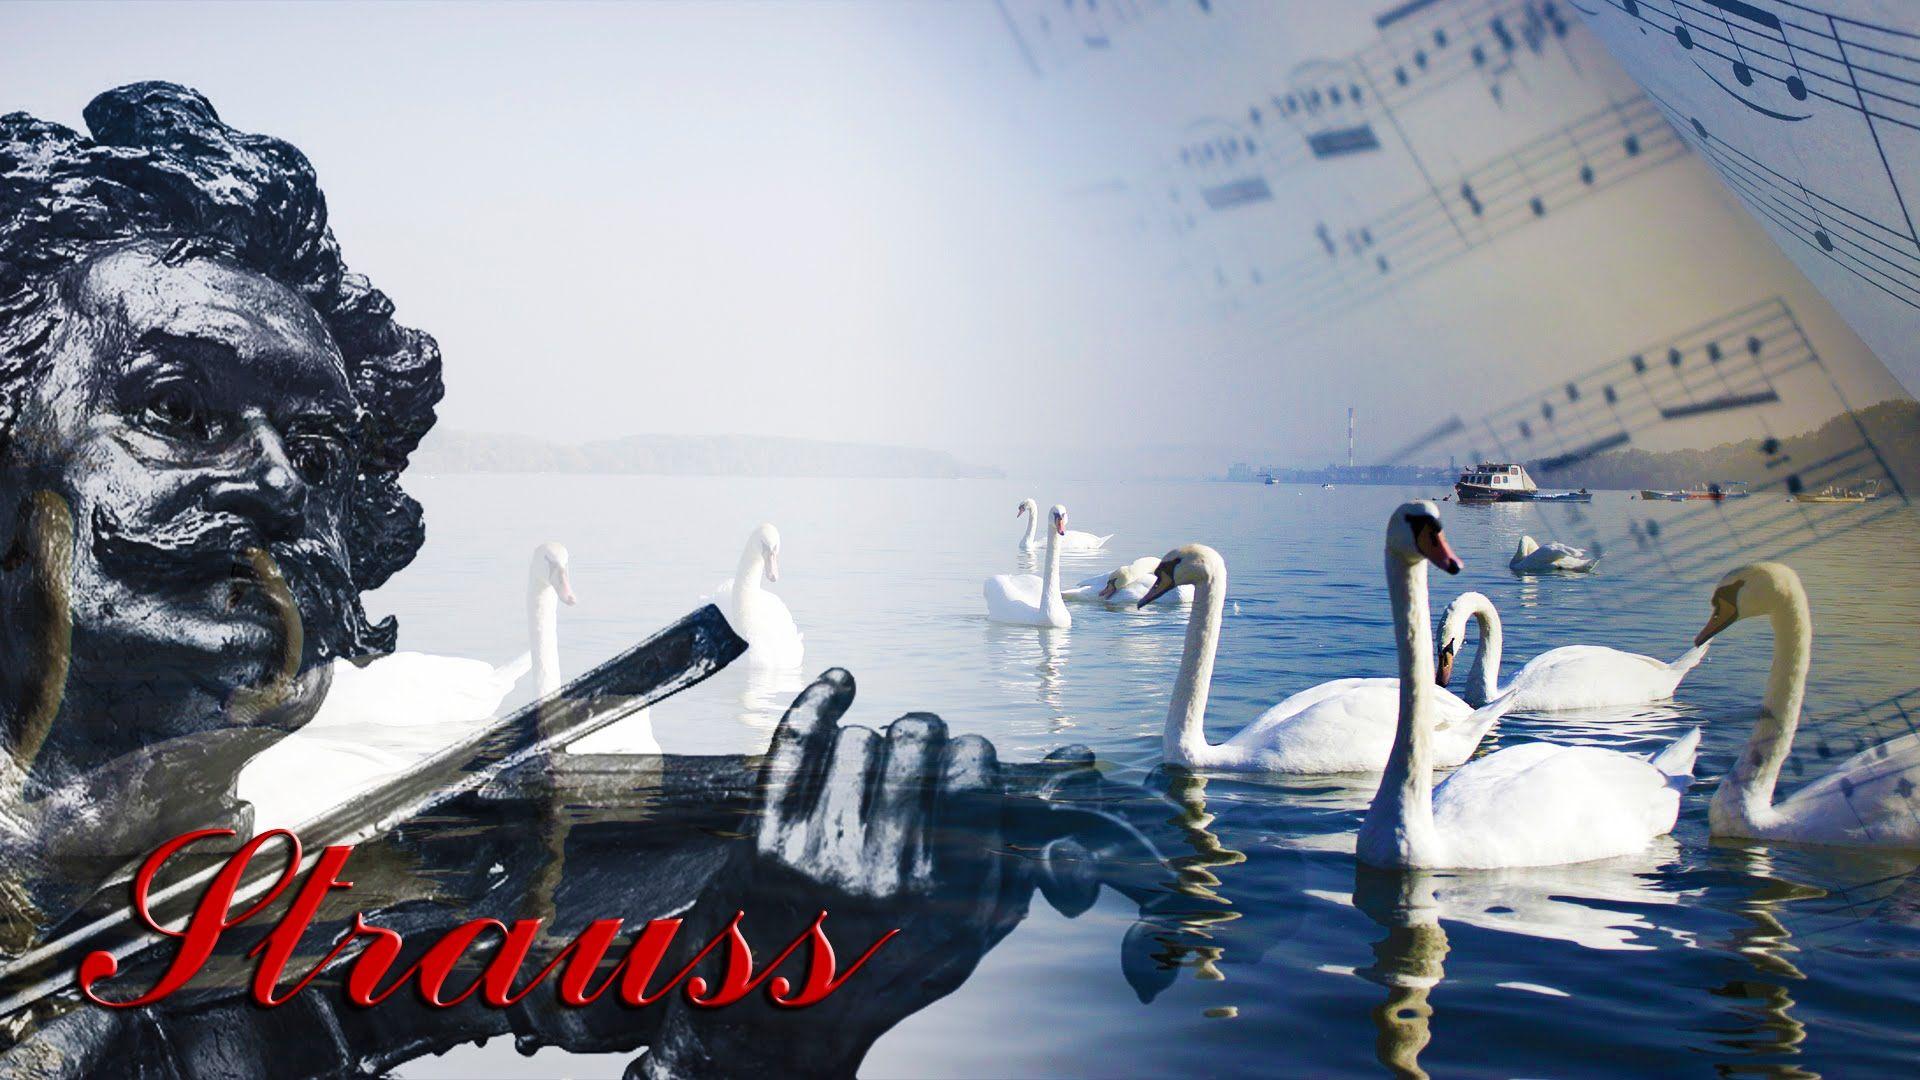 El Danubio Azul 1 Hora Johann Strauss Ii Vals Original Música Clásica De Orquesta Muchas Gracias Por Ver Est El Danubio Azul Musica Clasica Musica Variada